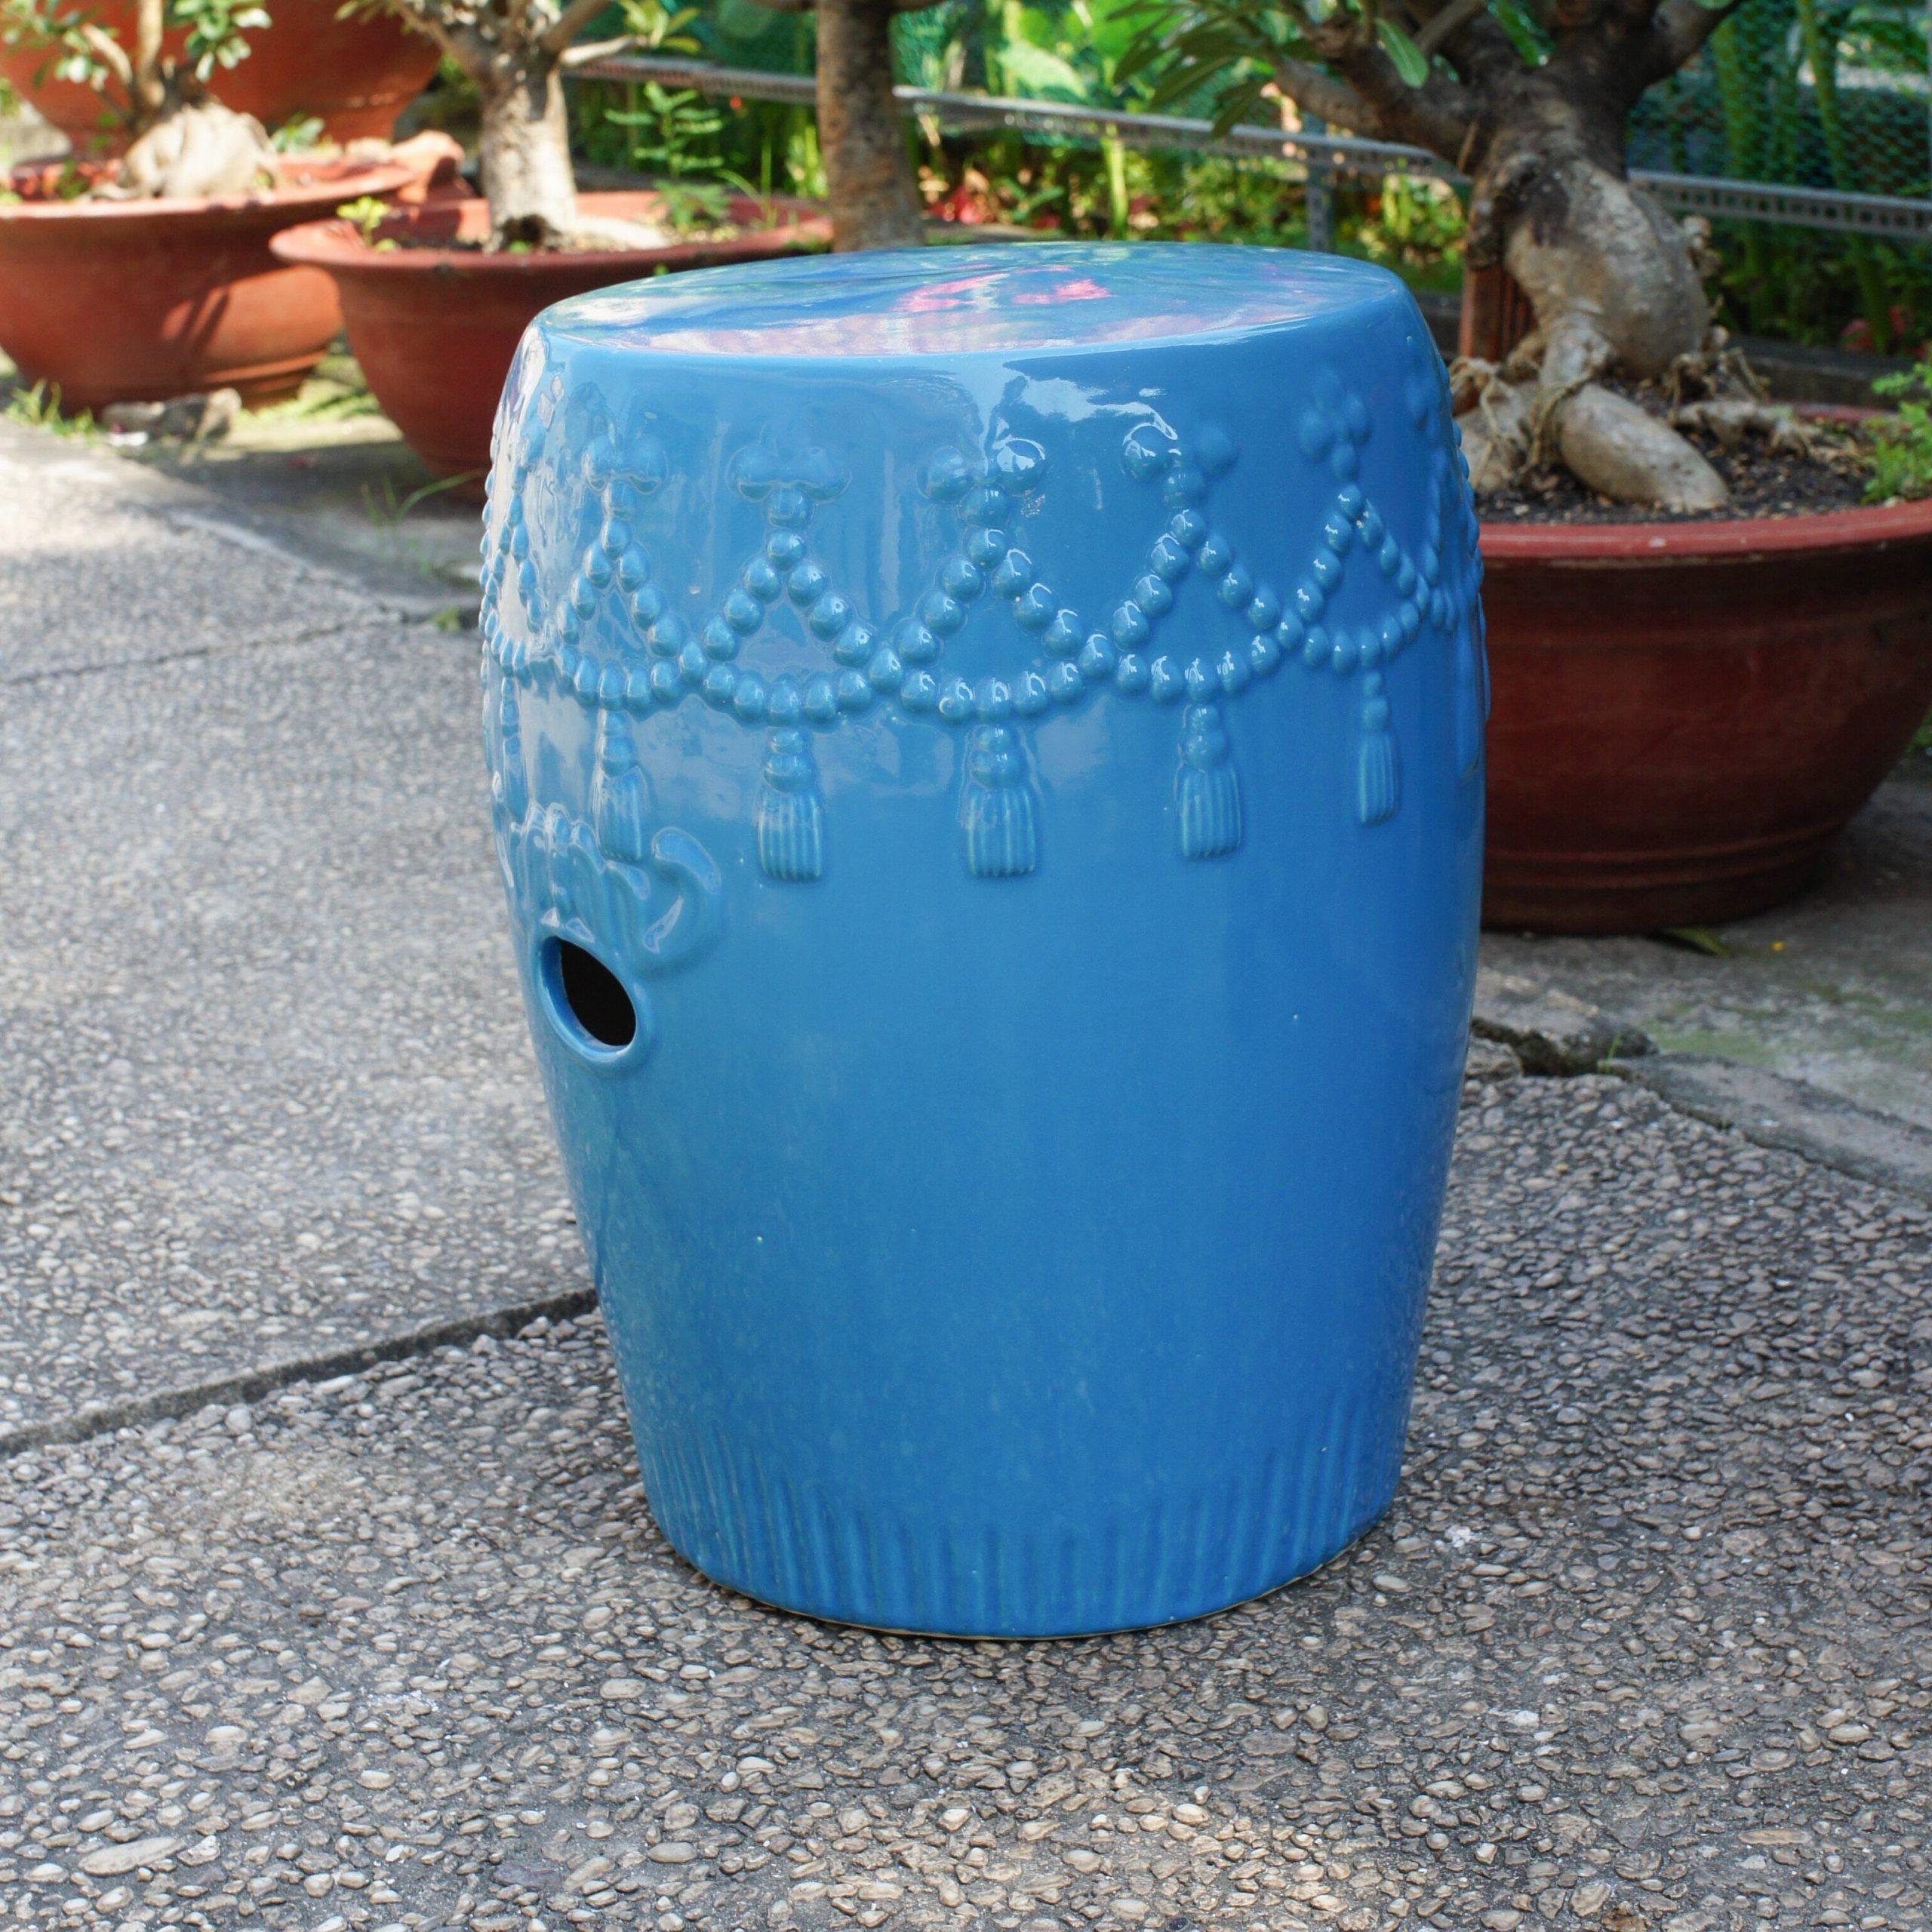 Weir Garden Stools Within Best And Newest Alonsa Drum Ceramic Garden Stool (View 6 of 30)